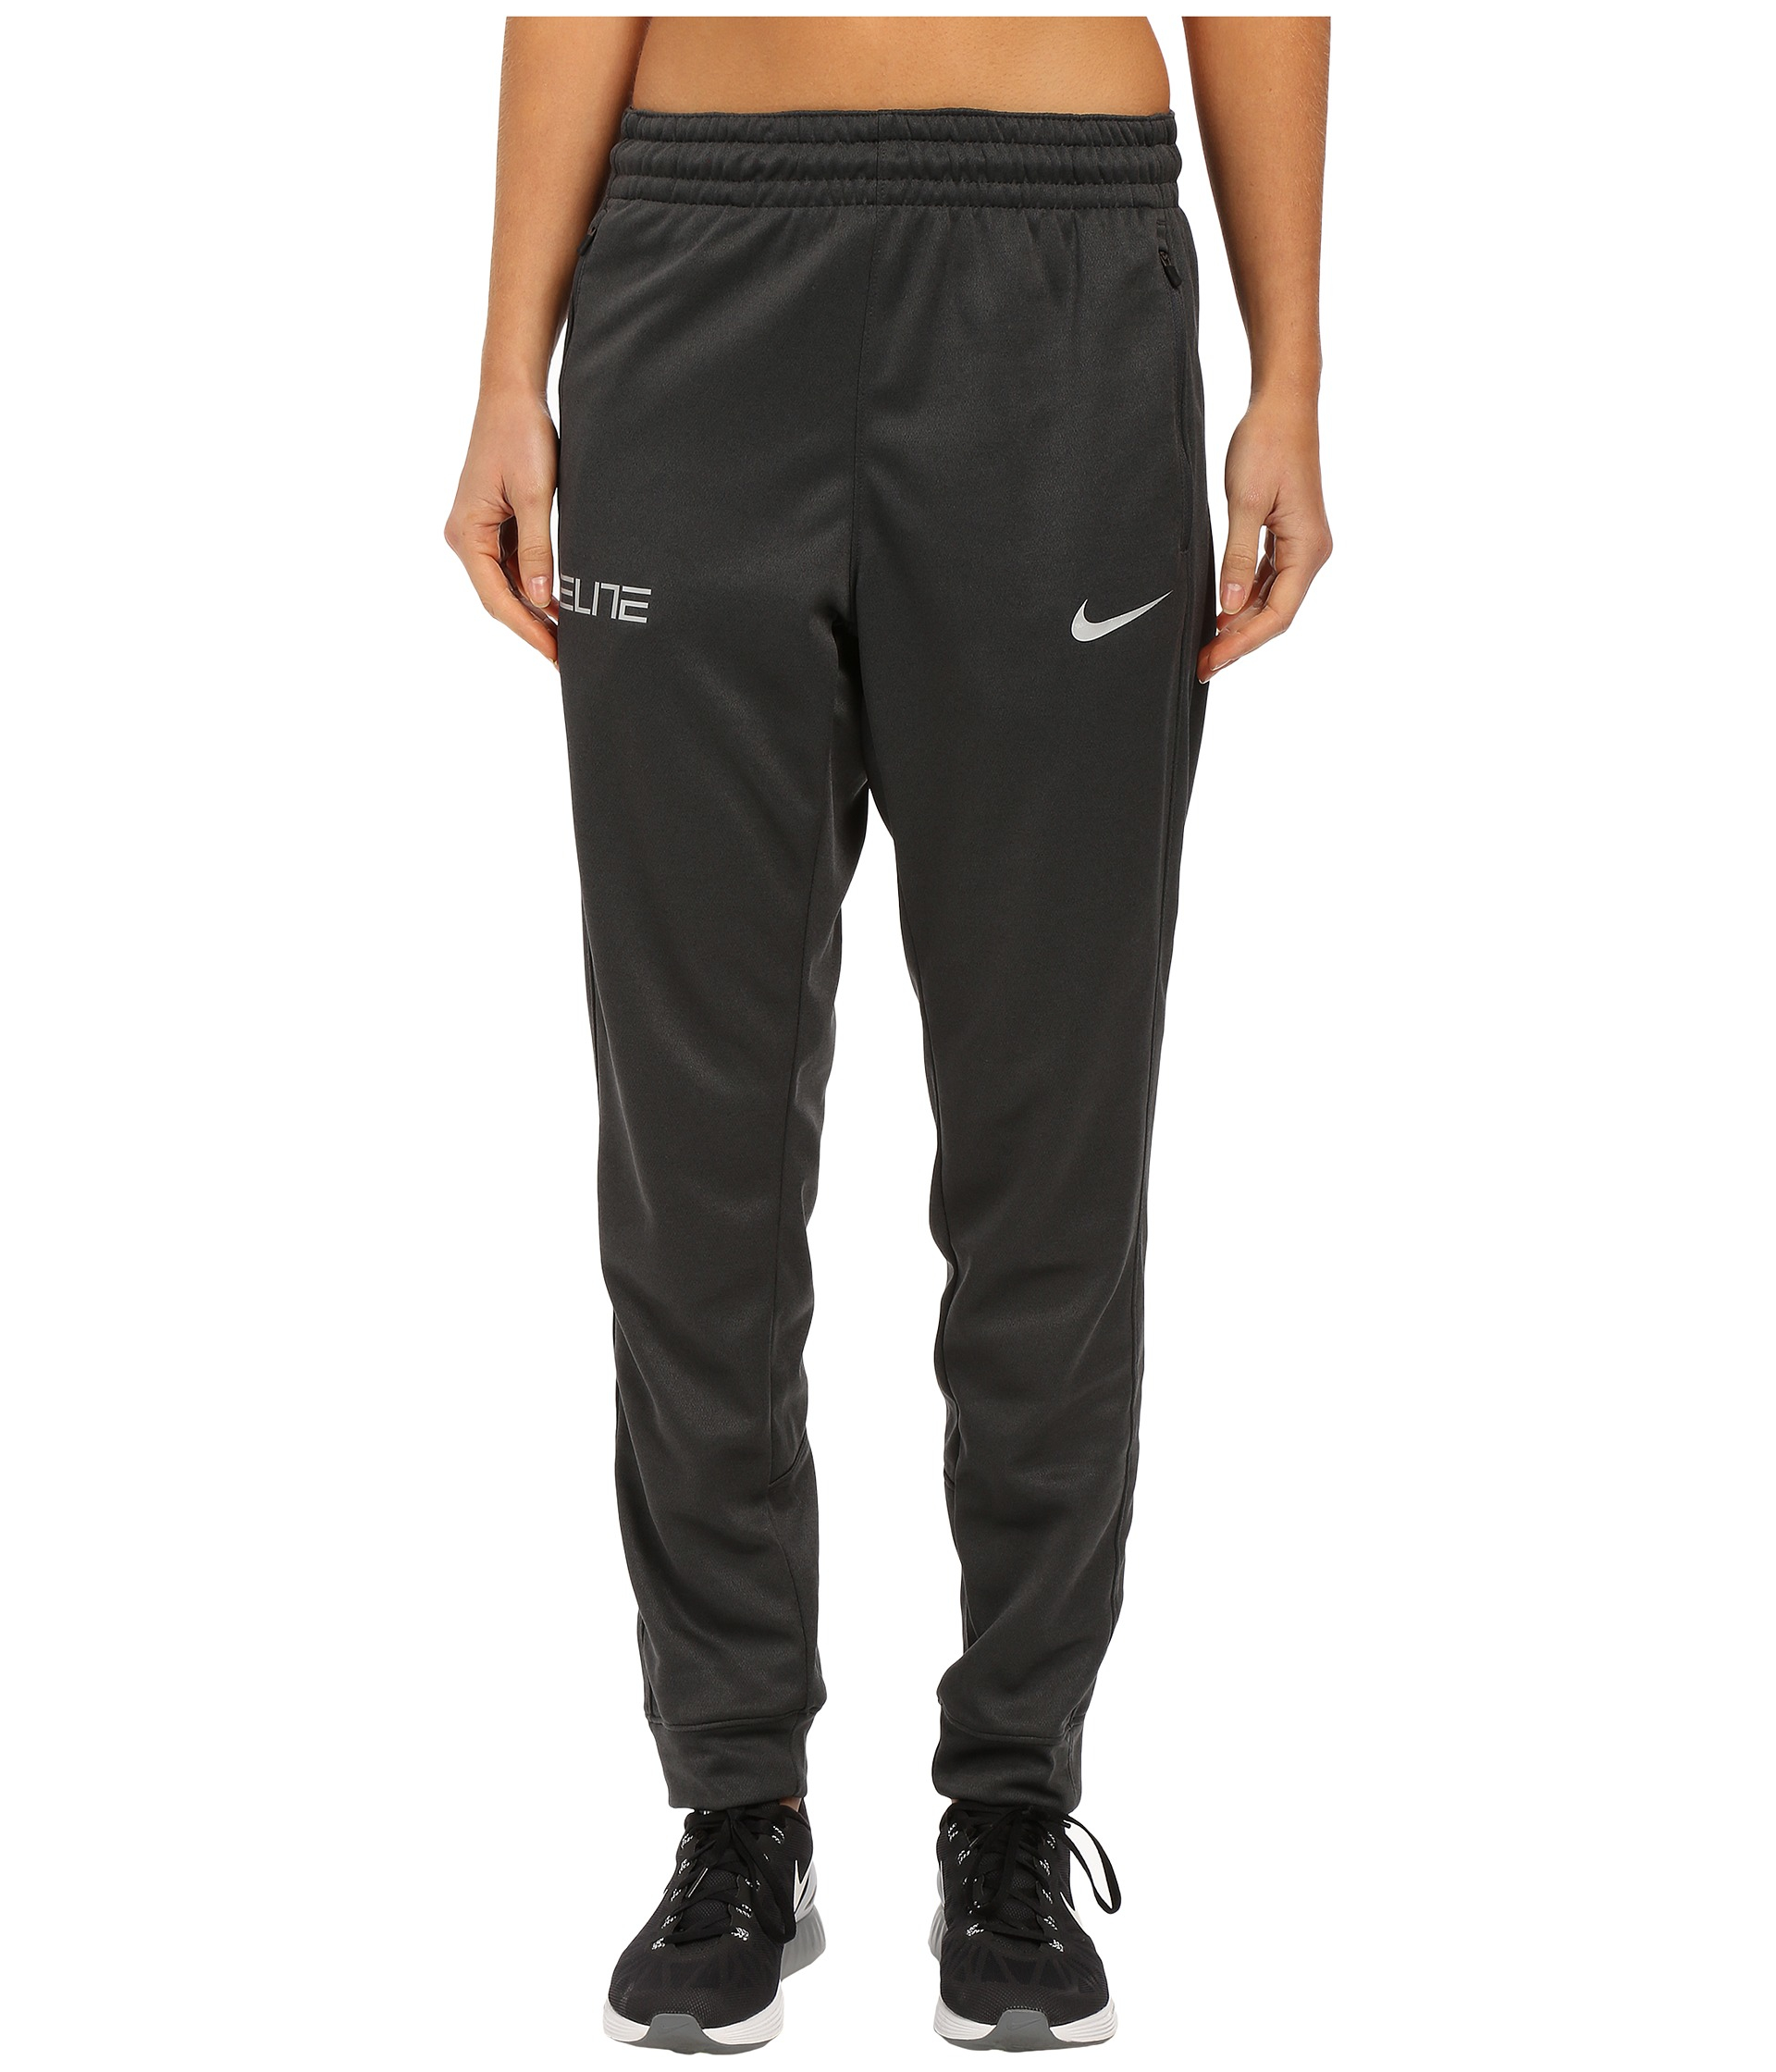 Nike Elite Cuff Pants in Gray for Men